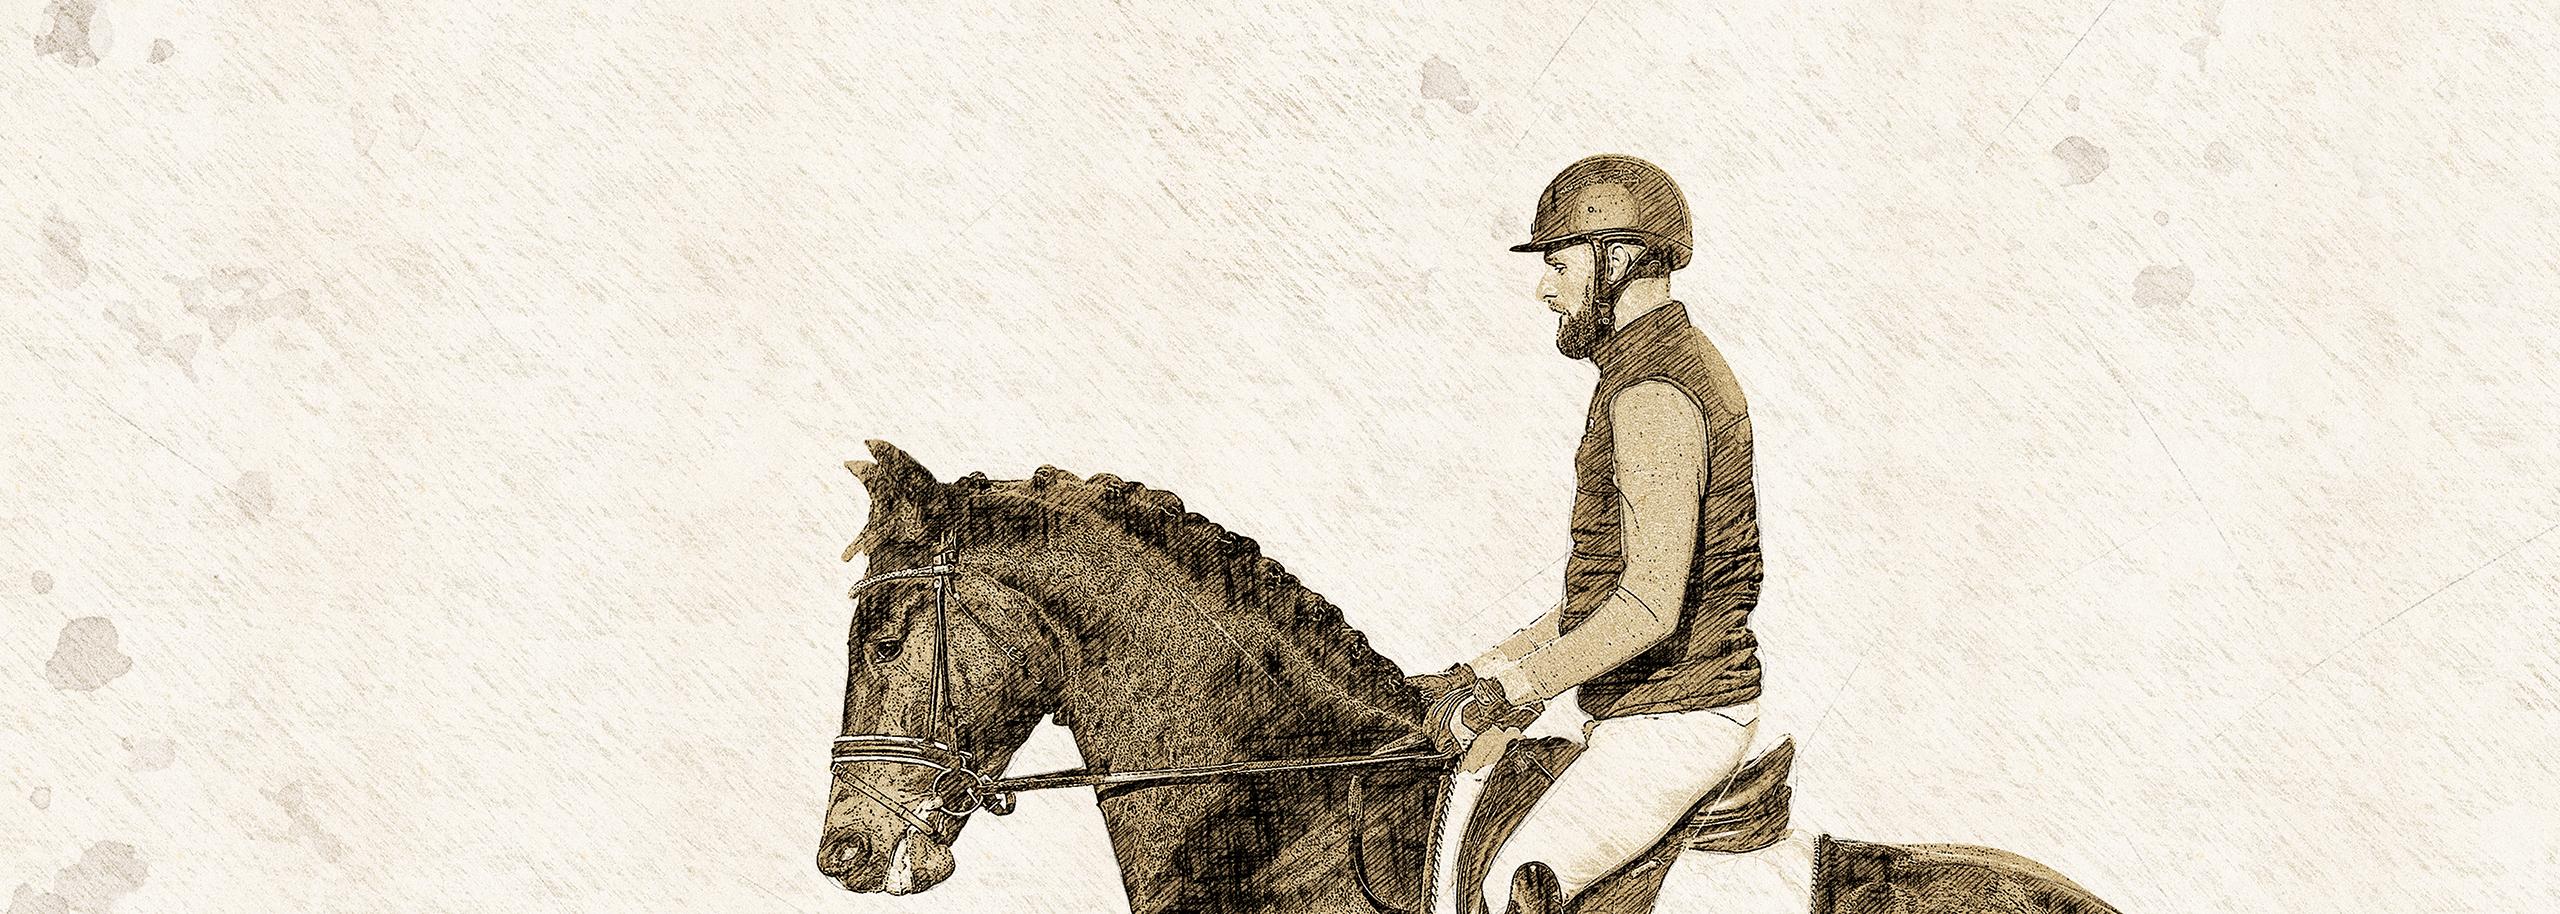 Thomas O'Brien Equestrian